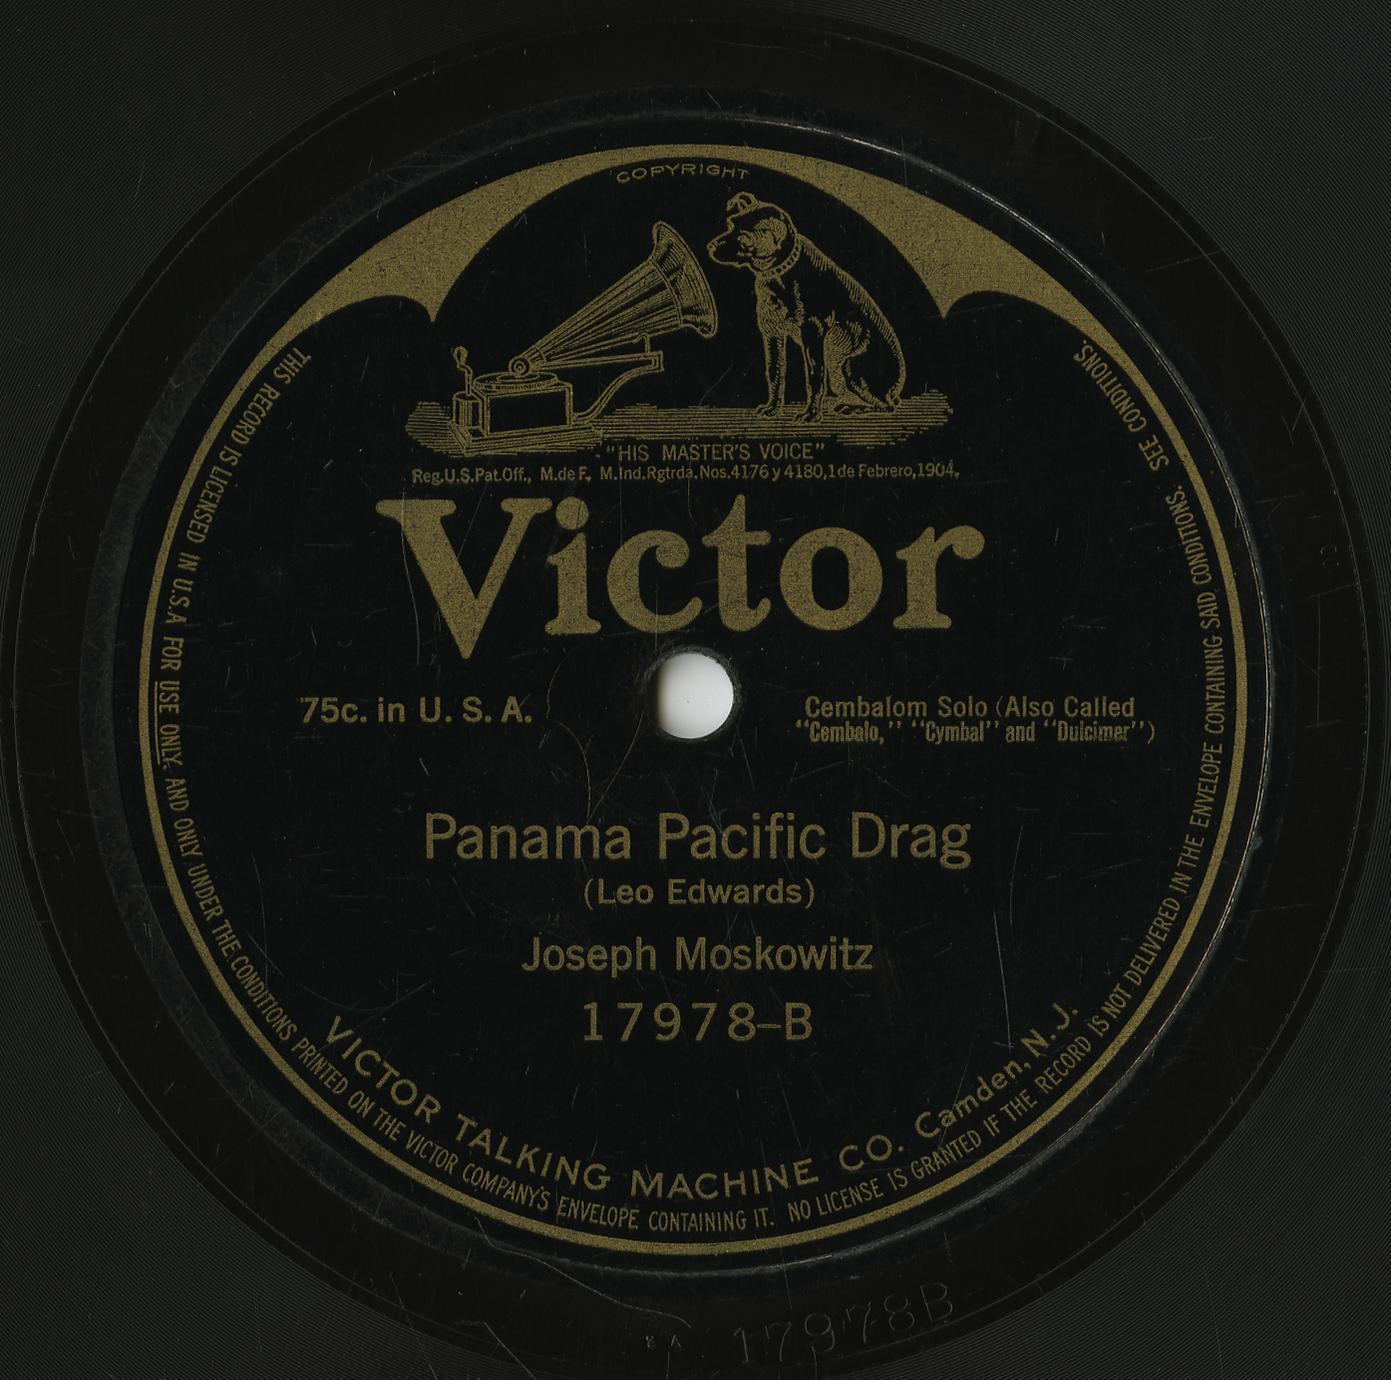 Panama pacific drag (1 of 2)